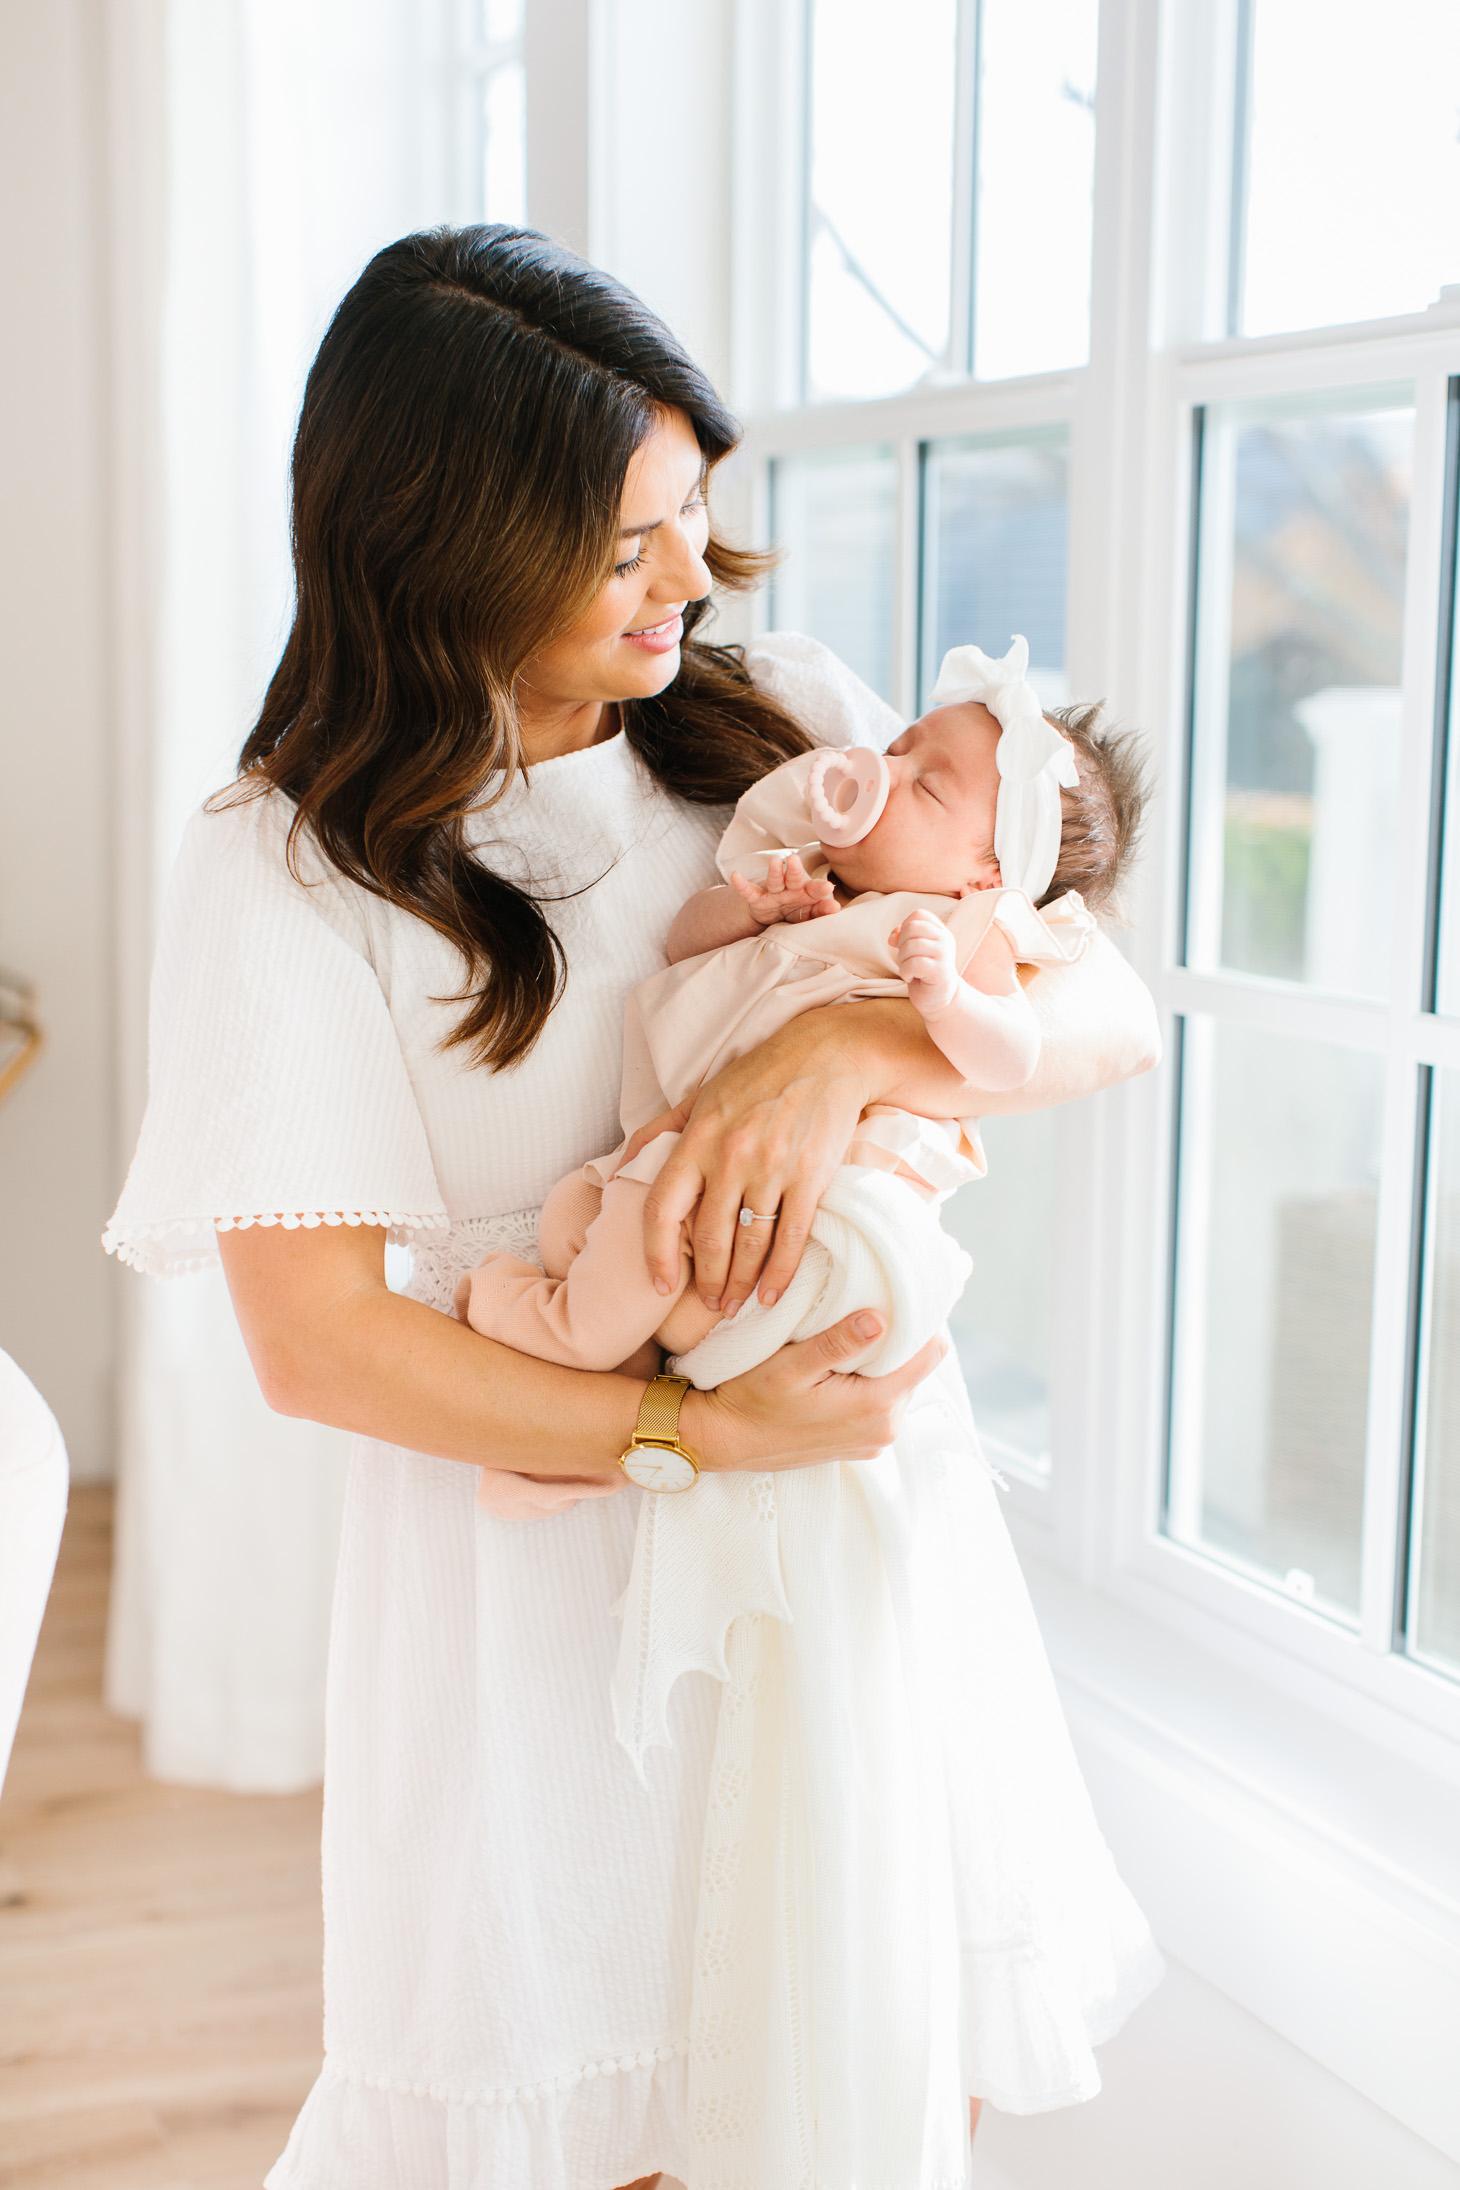 Jillian Harris Personal Highlights from 2018